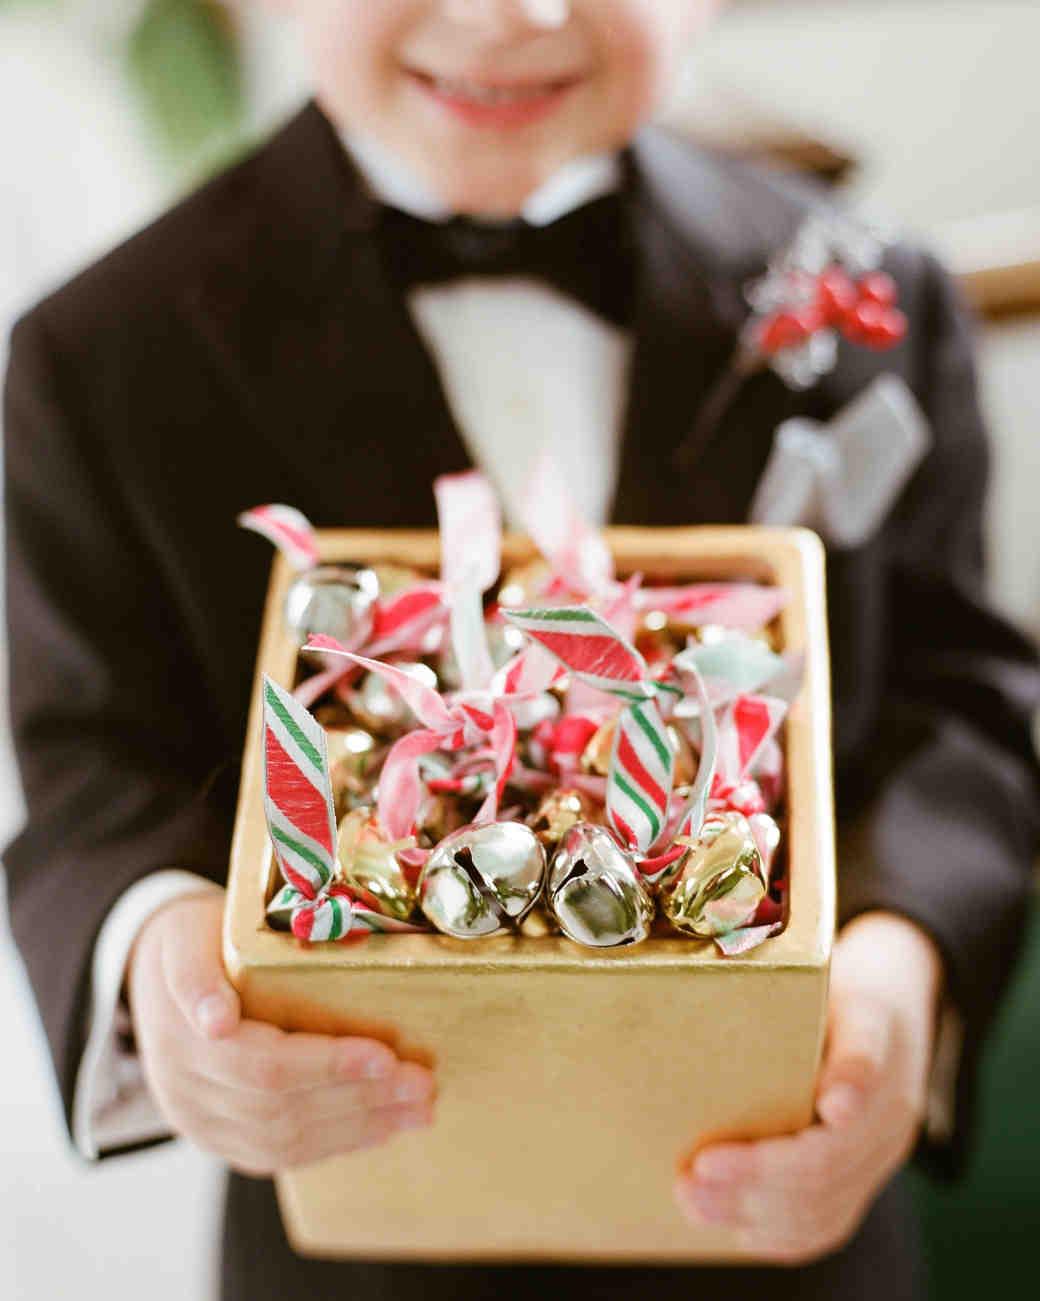 paige-michael-wedding-bells-0640-s112431-1215.jpg